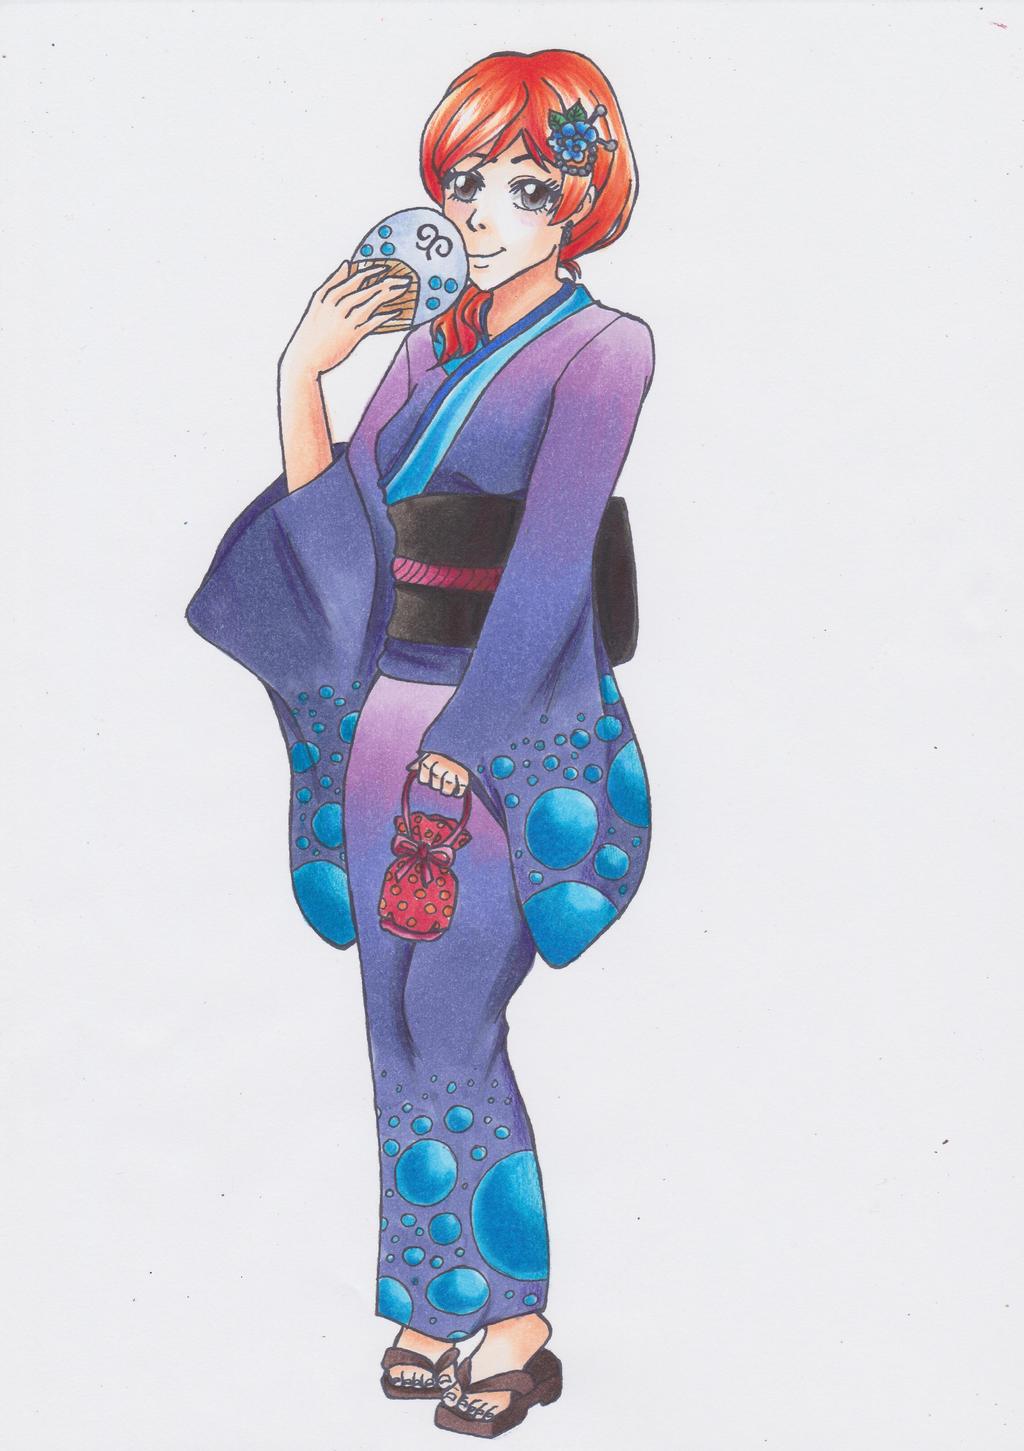 Collaboration with Shiroichi Art | Kimono Girls by CrystalMelody-FT